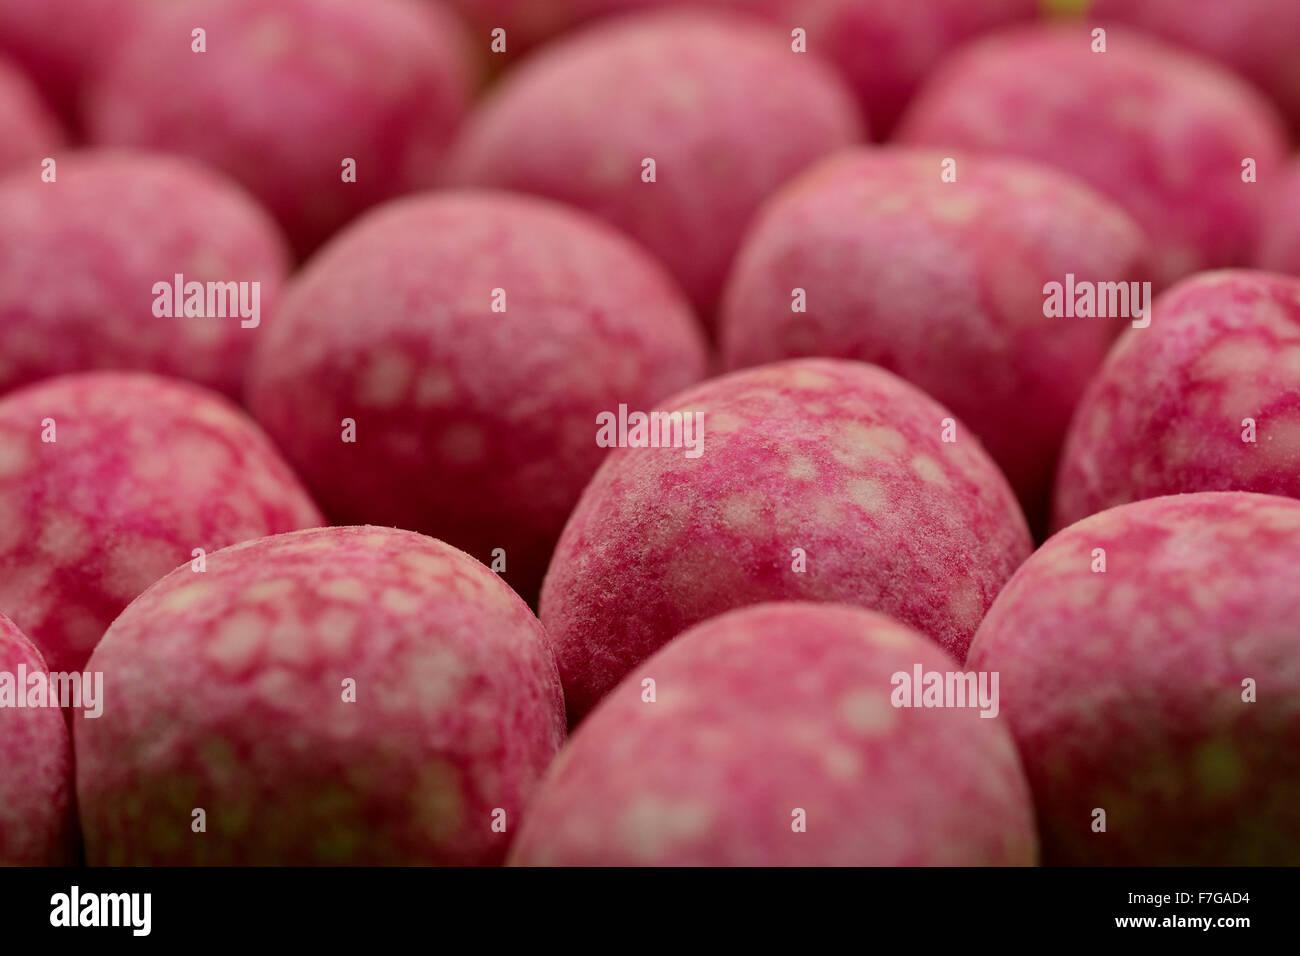 Rosa Bonbons closeup Stockbild